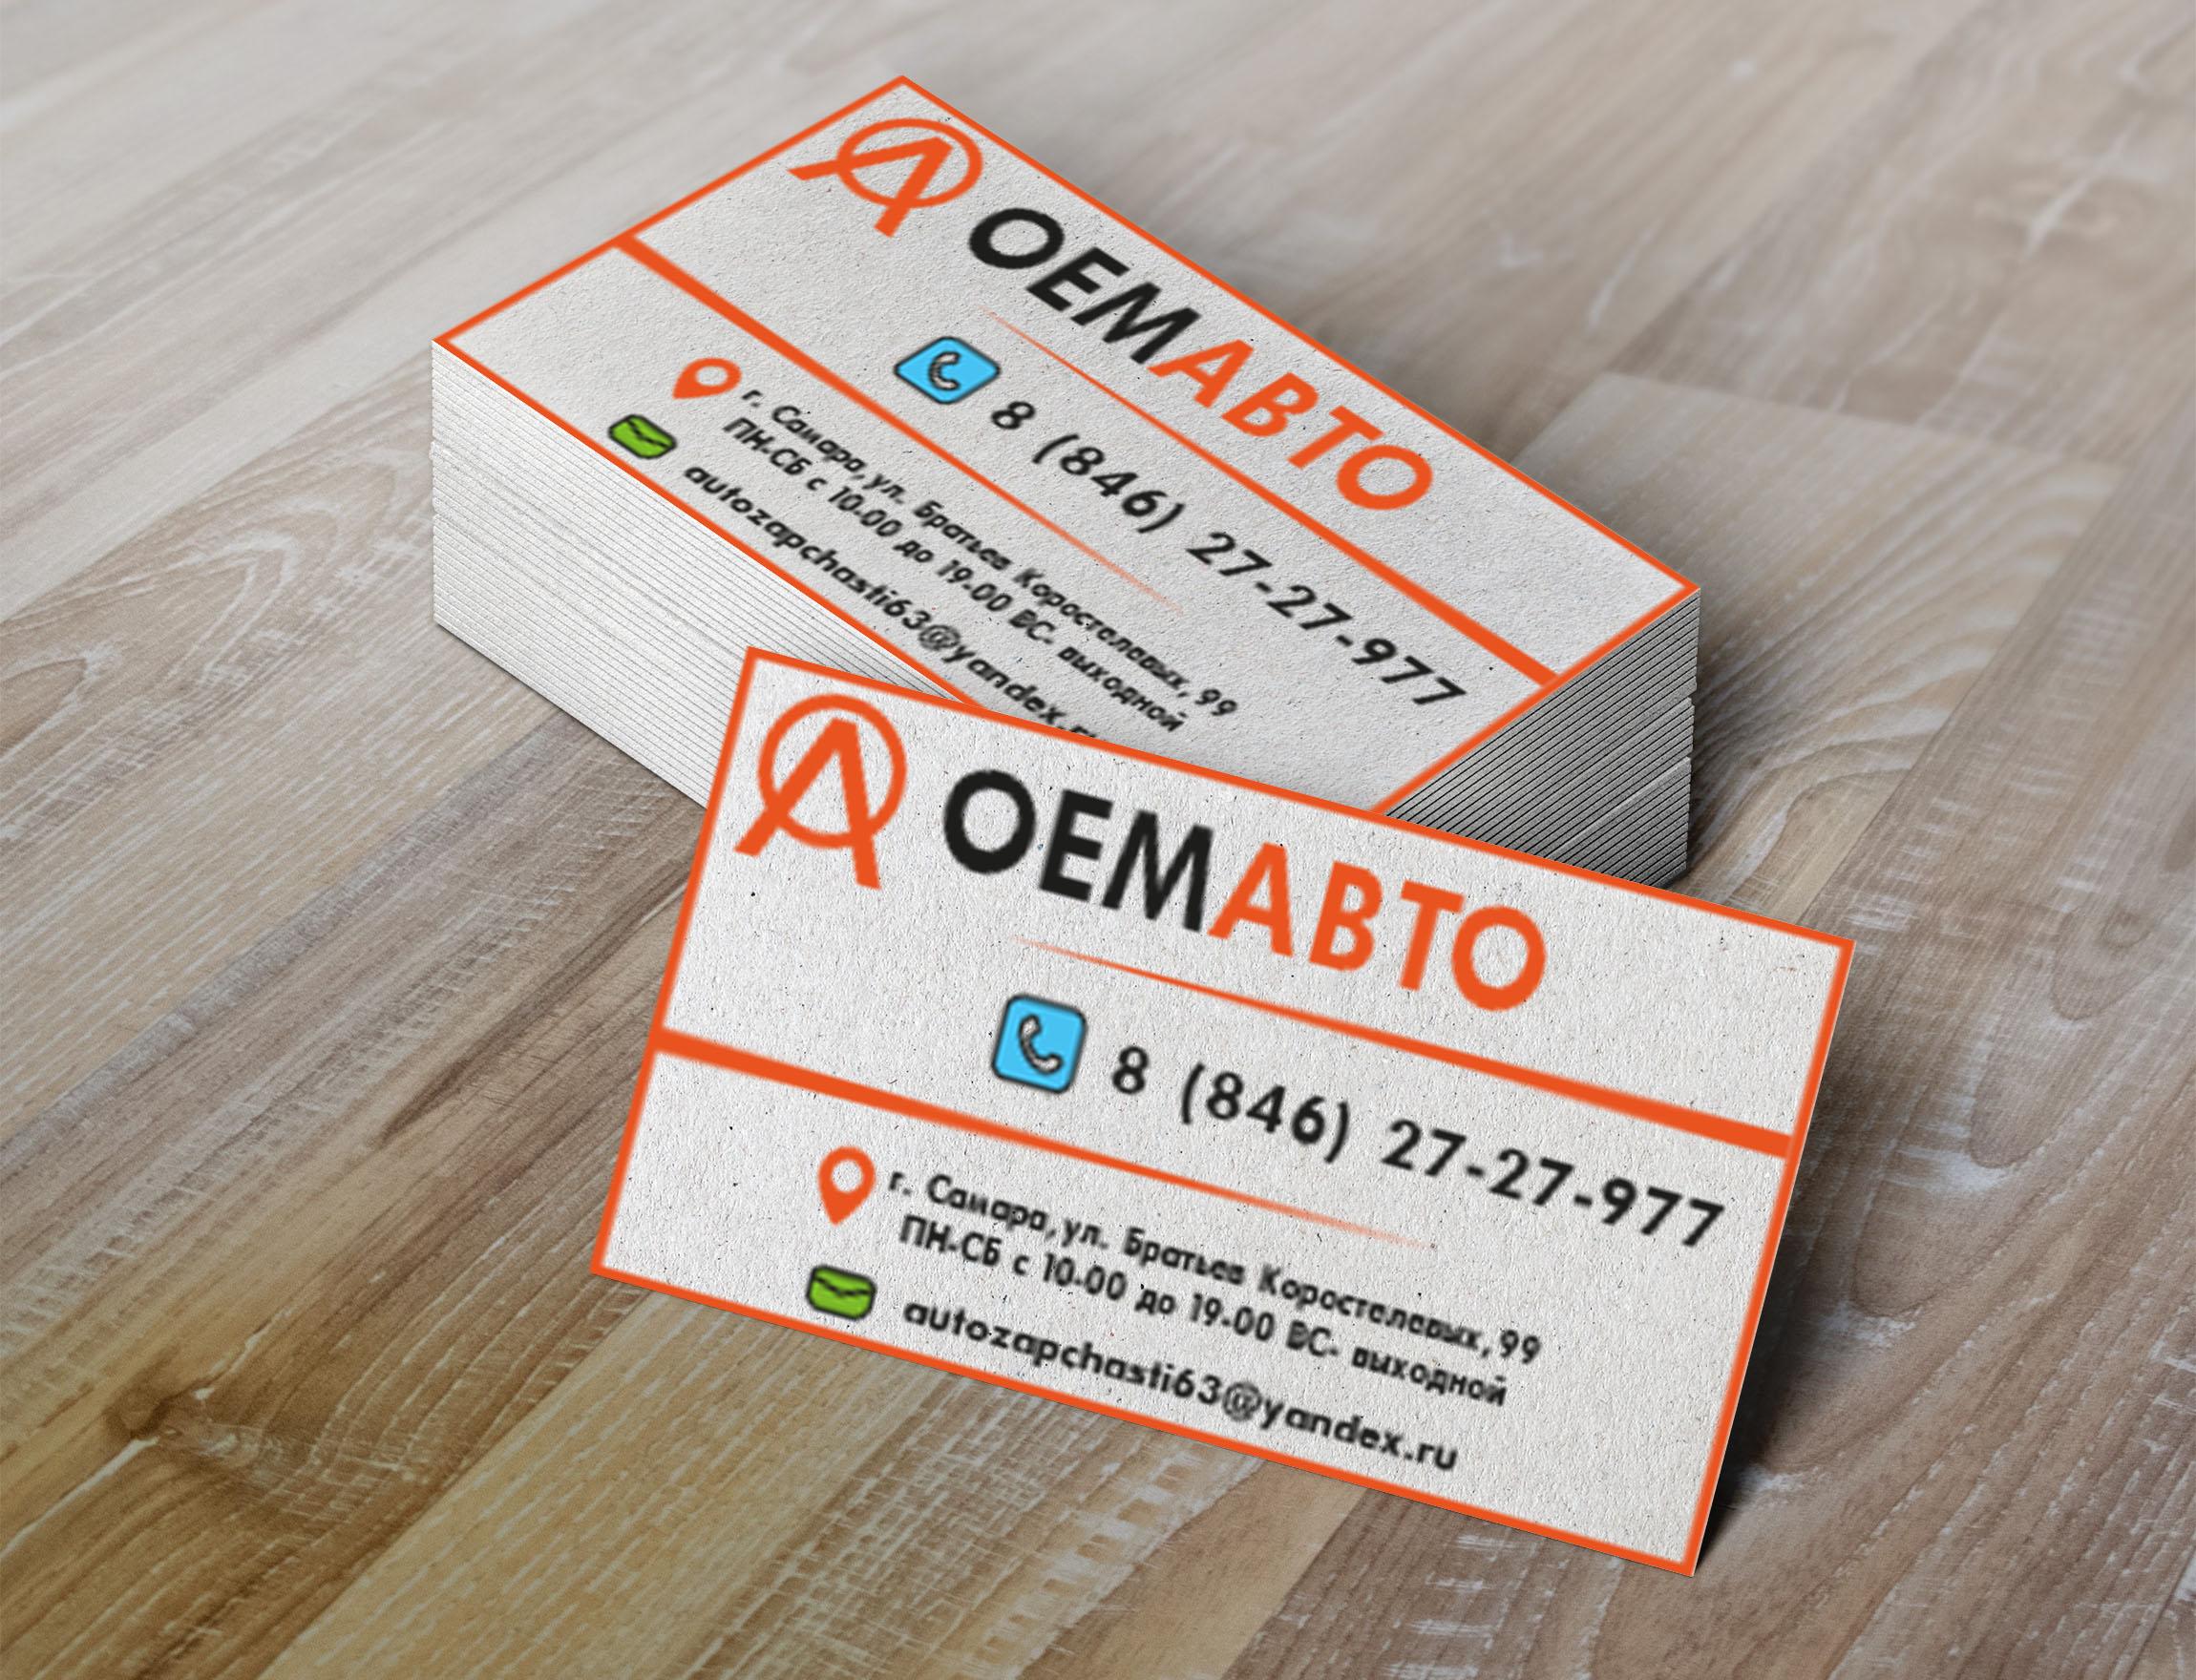 Разработать логотип и дизайн визитки  фото f_7735b7331caa659c.jpg